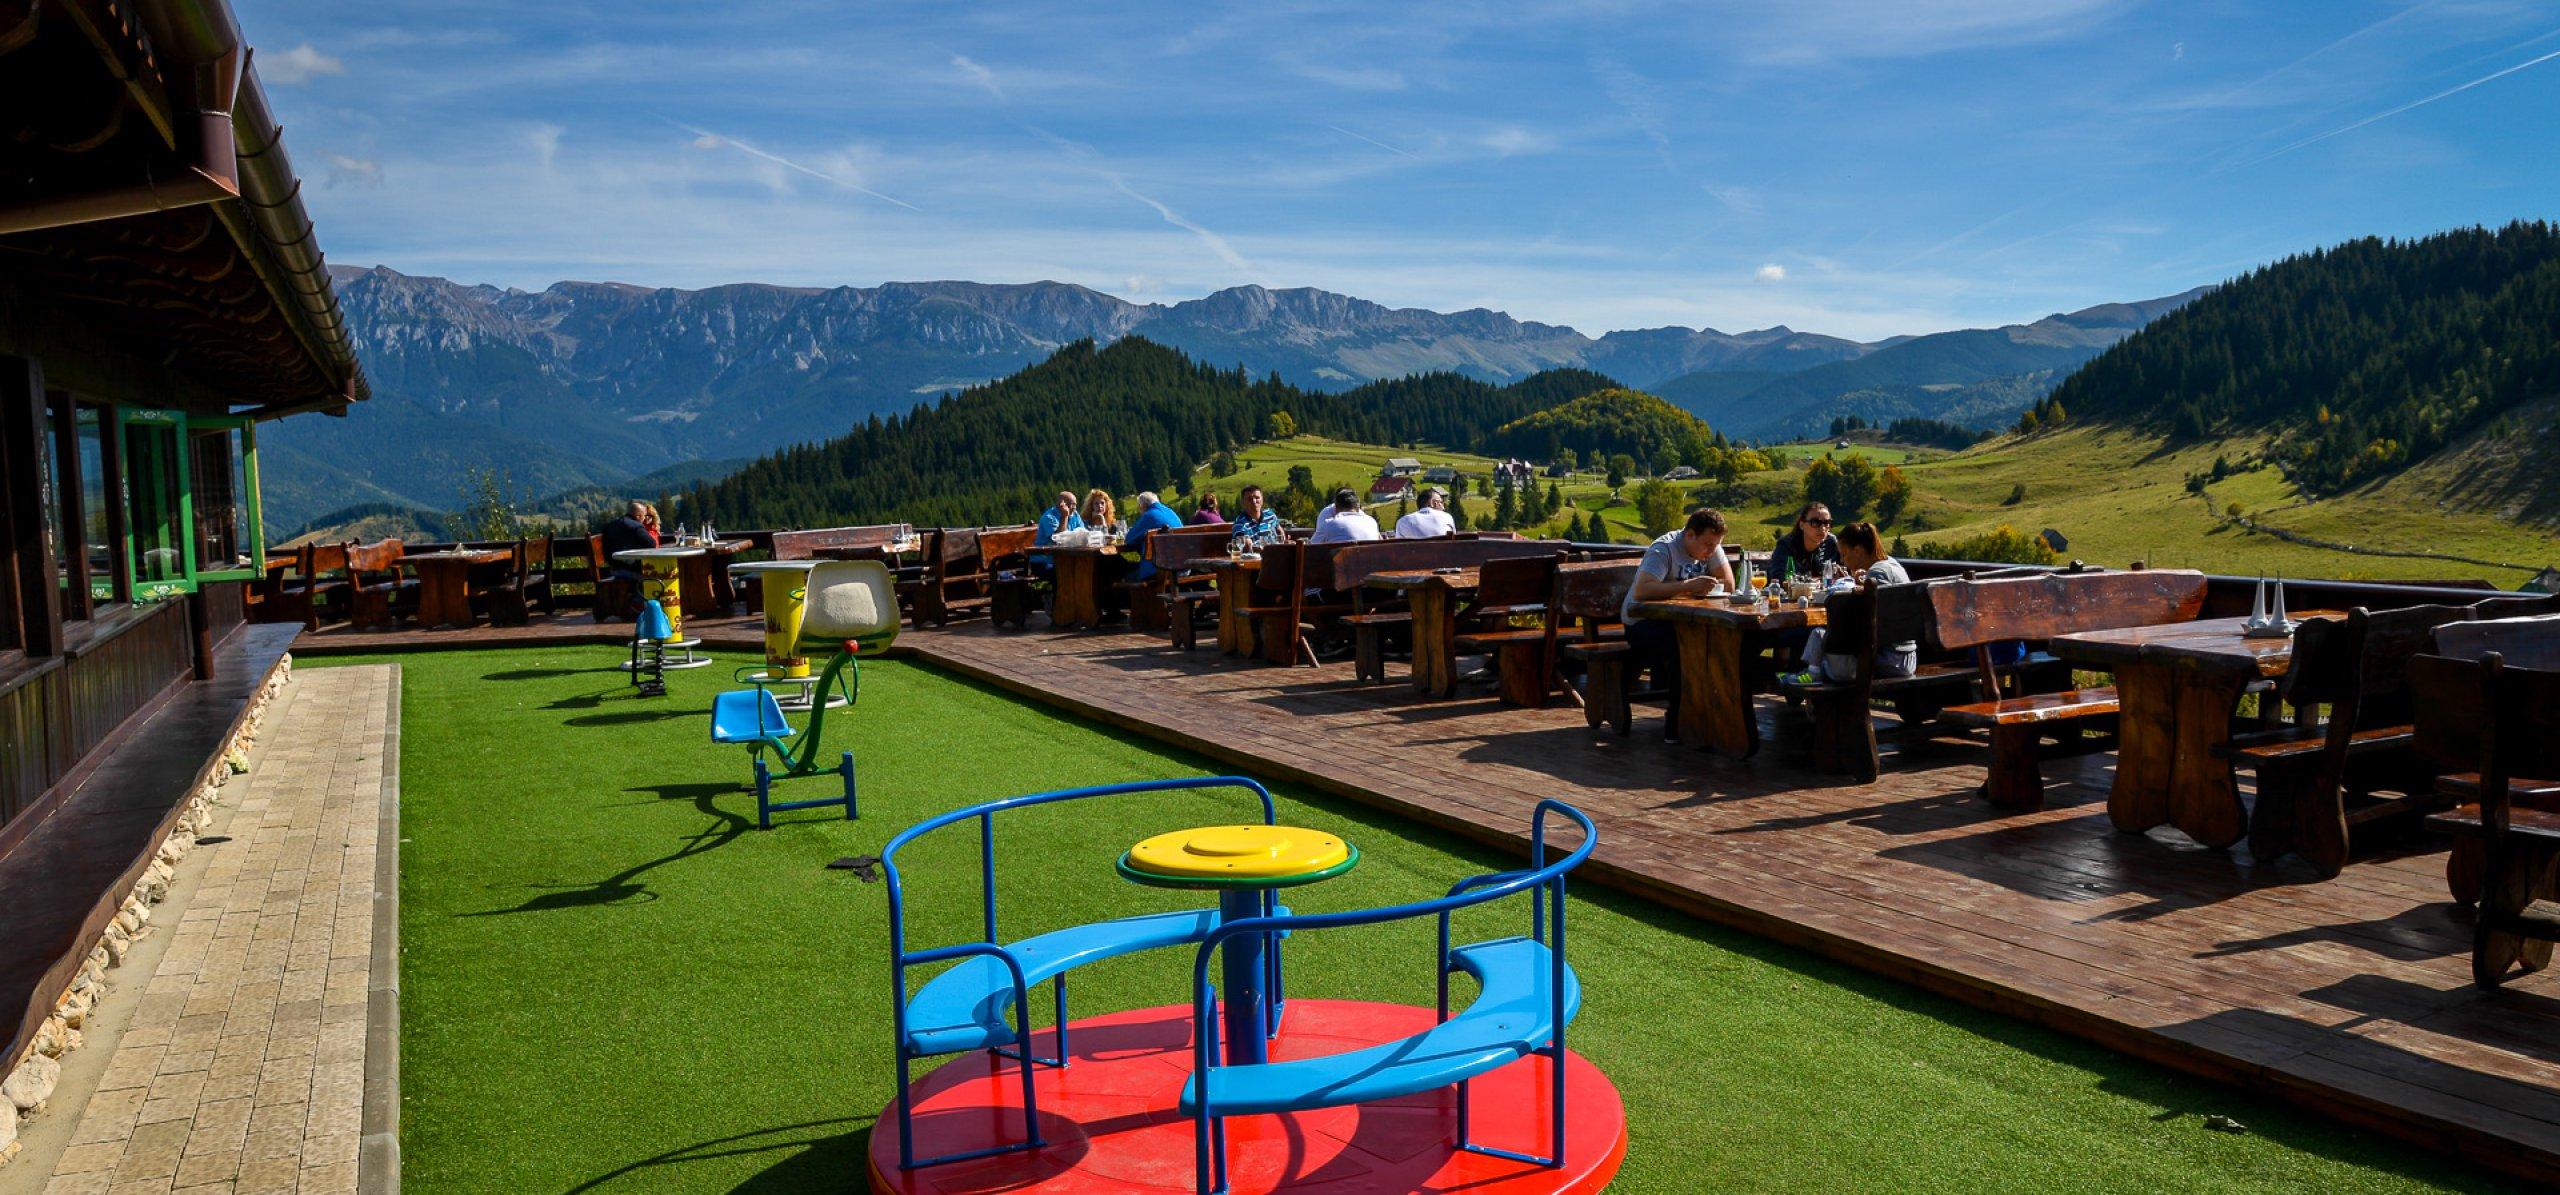 parc-de-aventura-restaurant-fundata-cheile-gradistei-restaurant